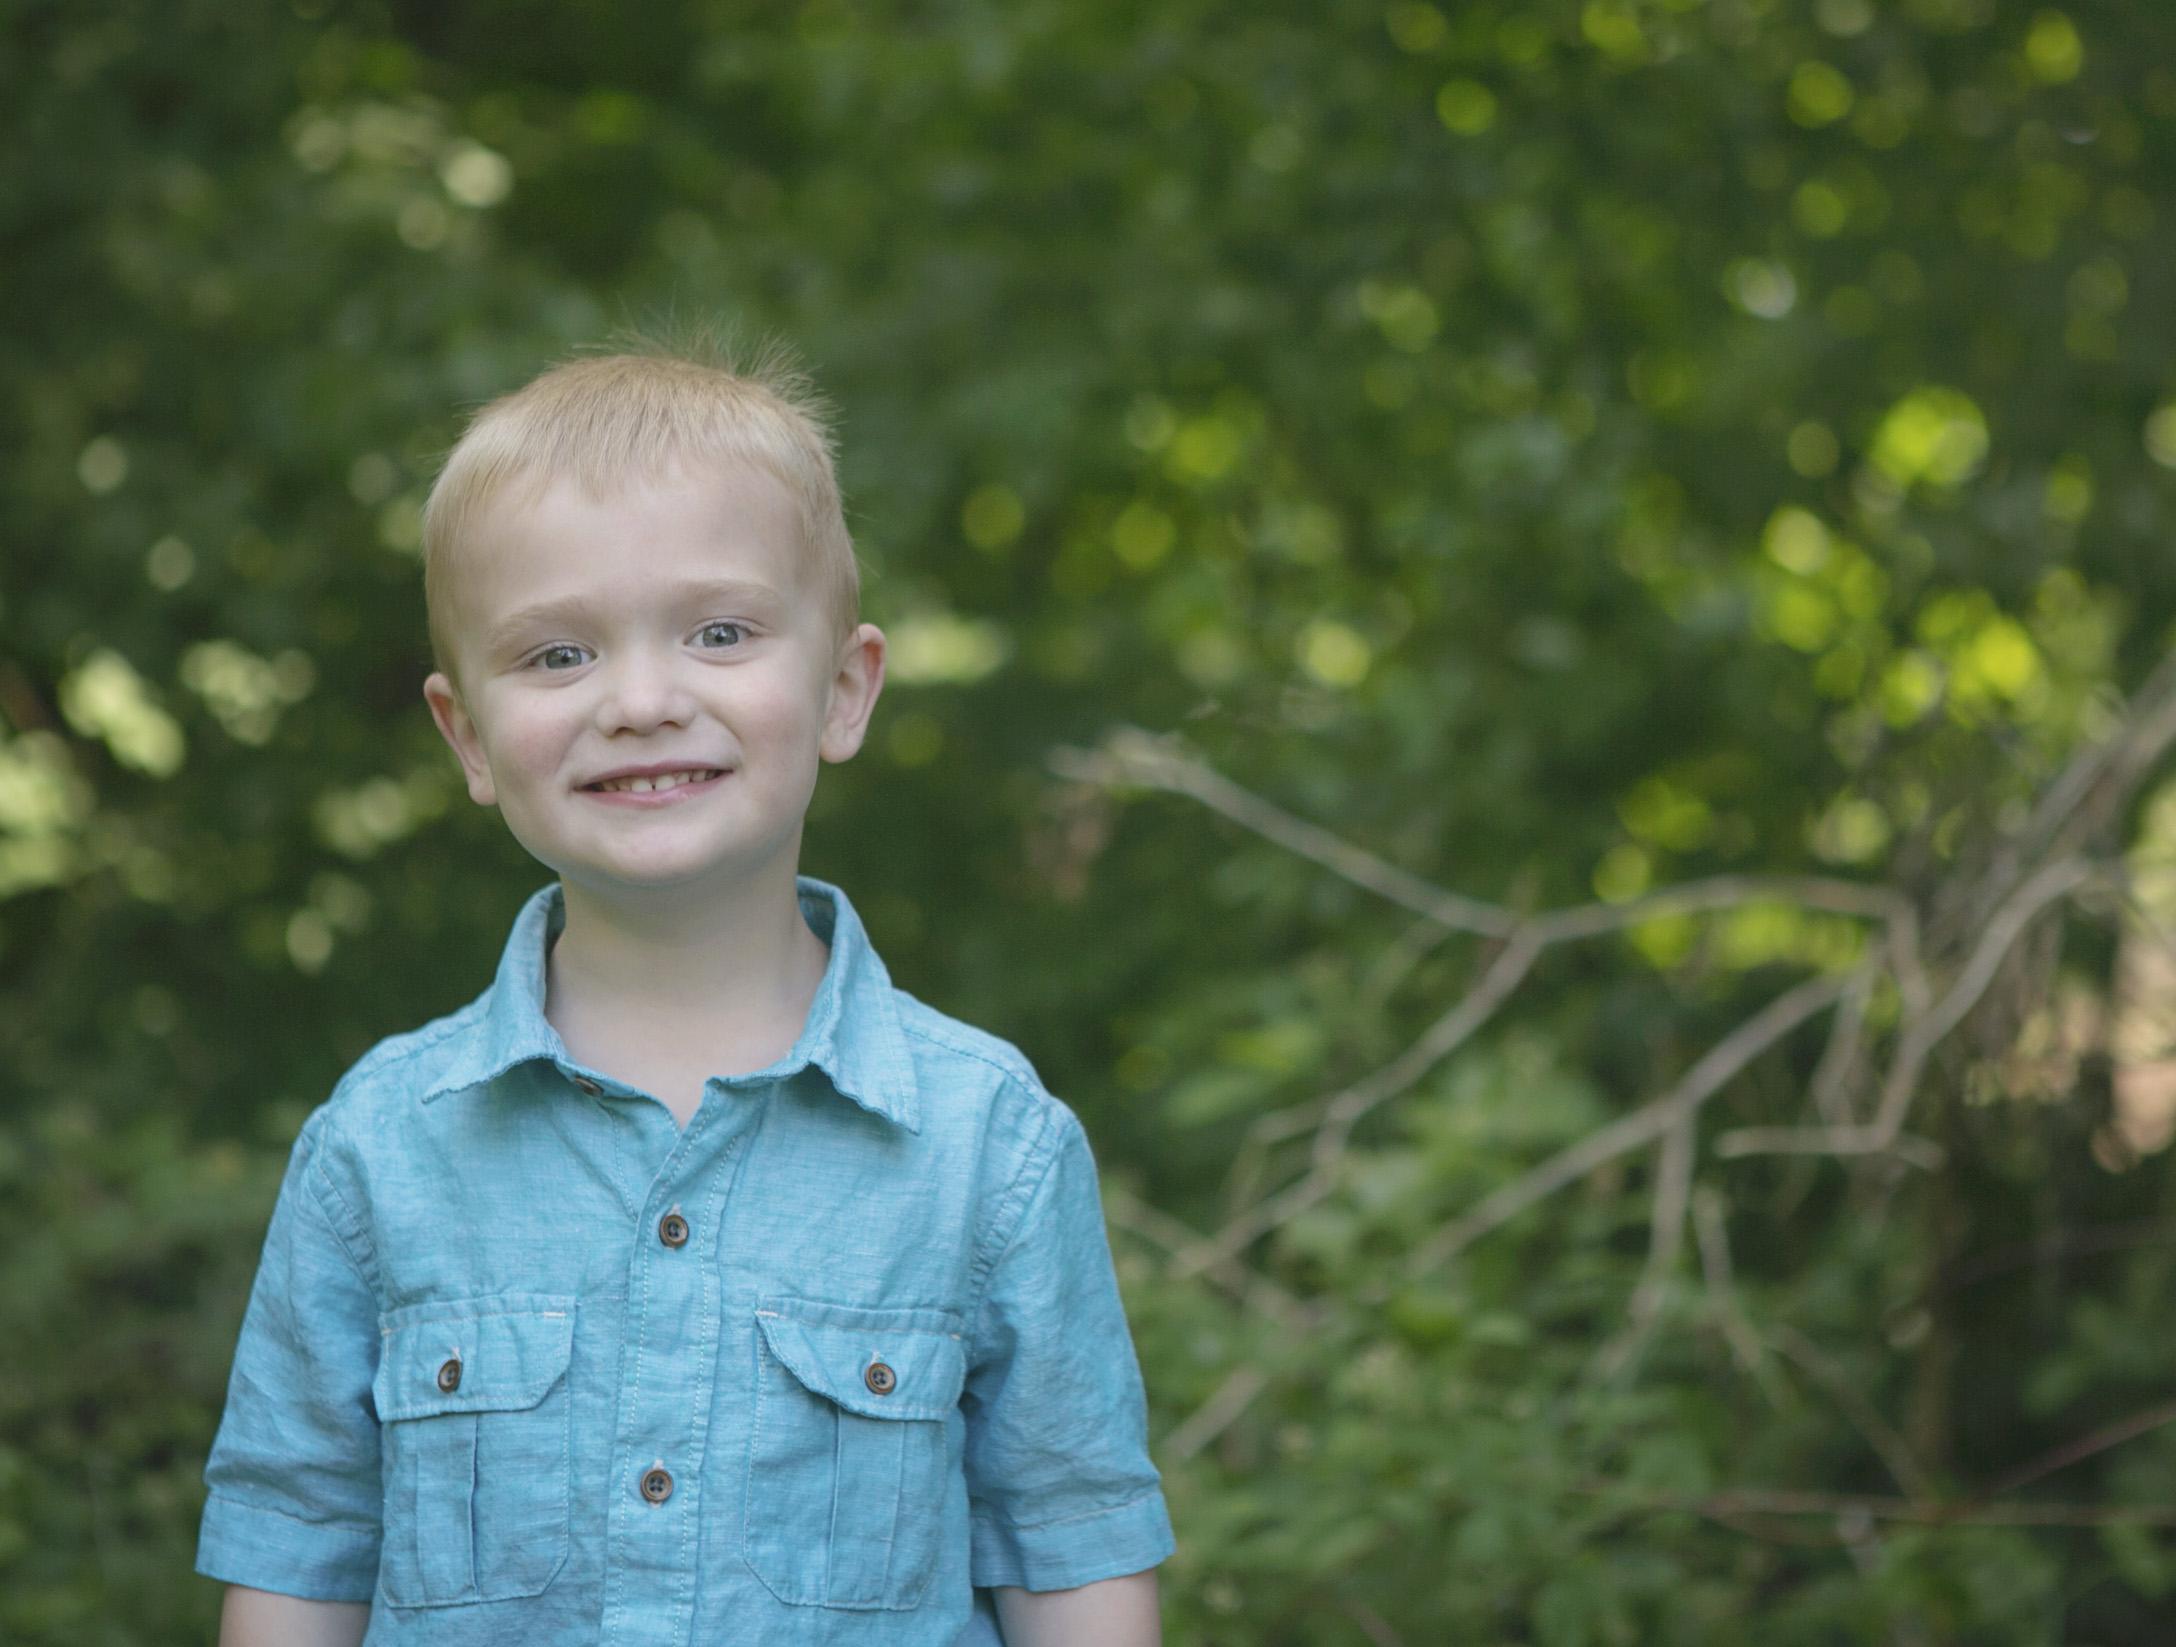 Grand Rapids Portrait Photographer